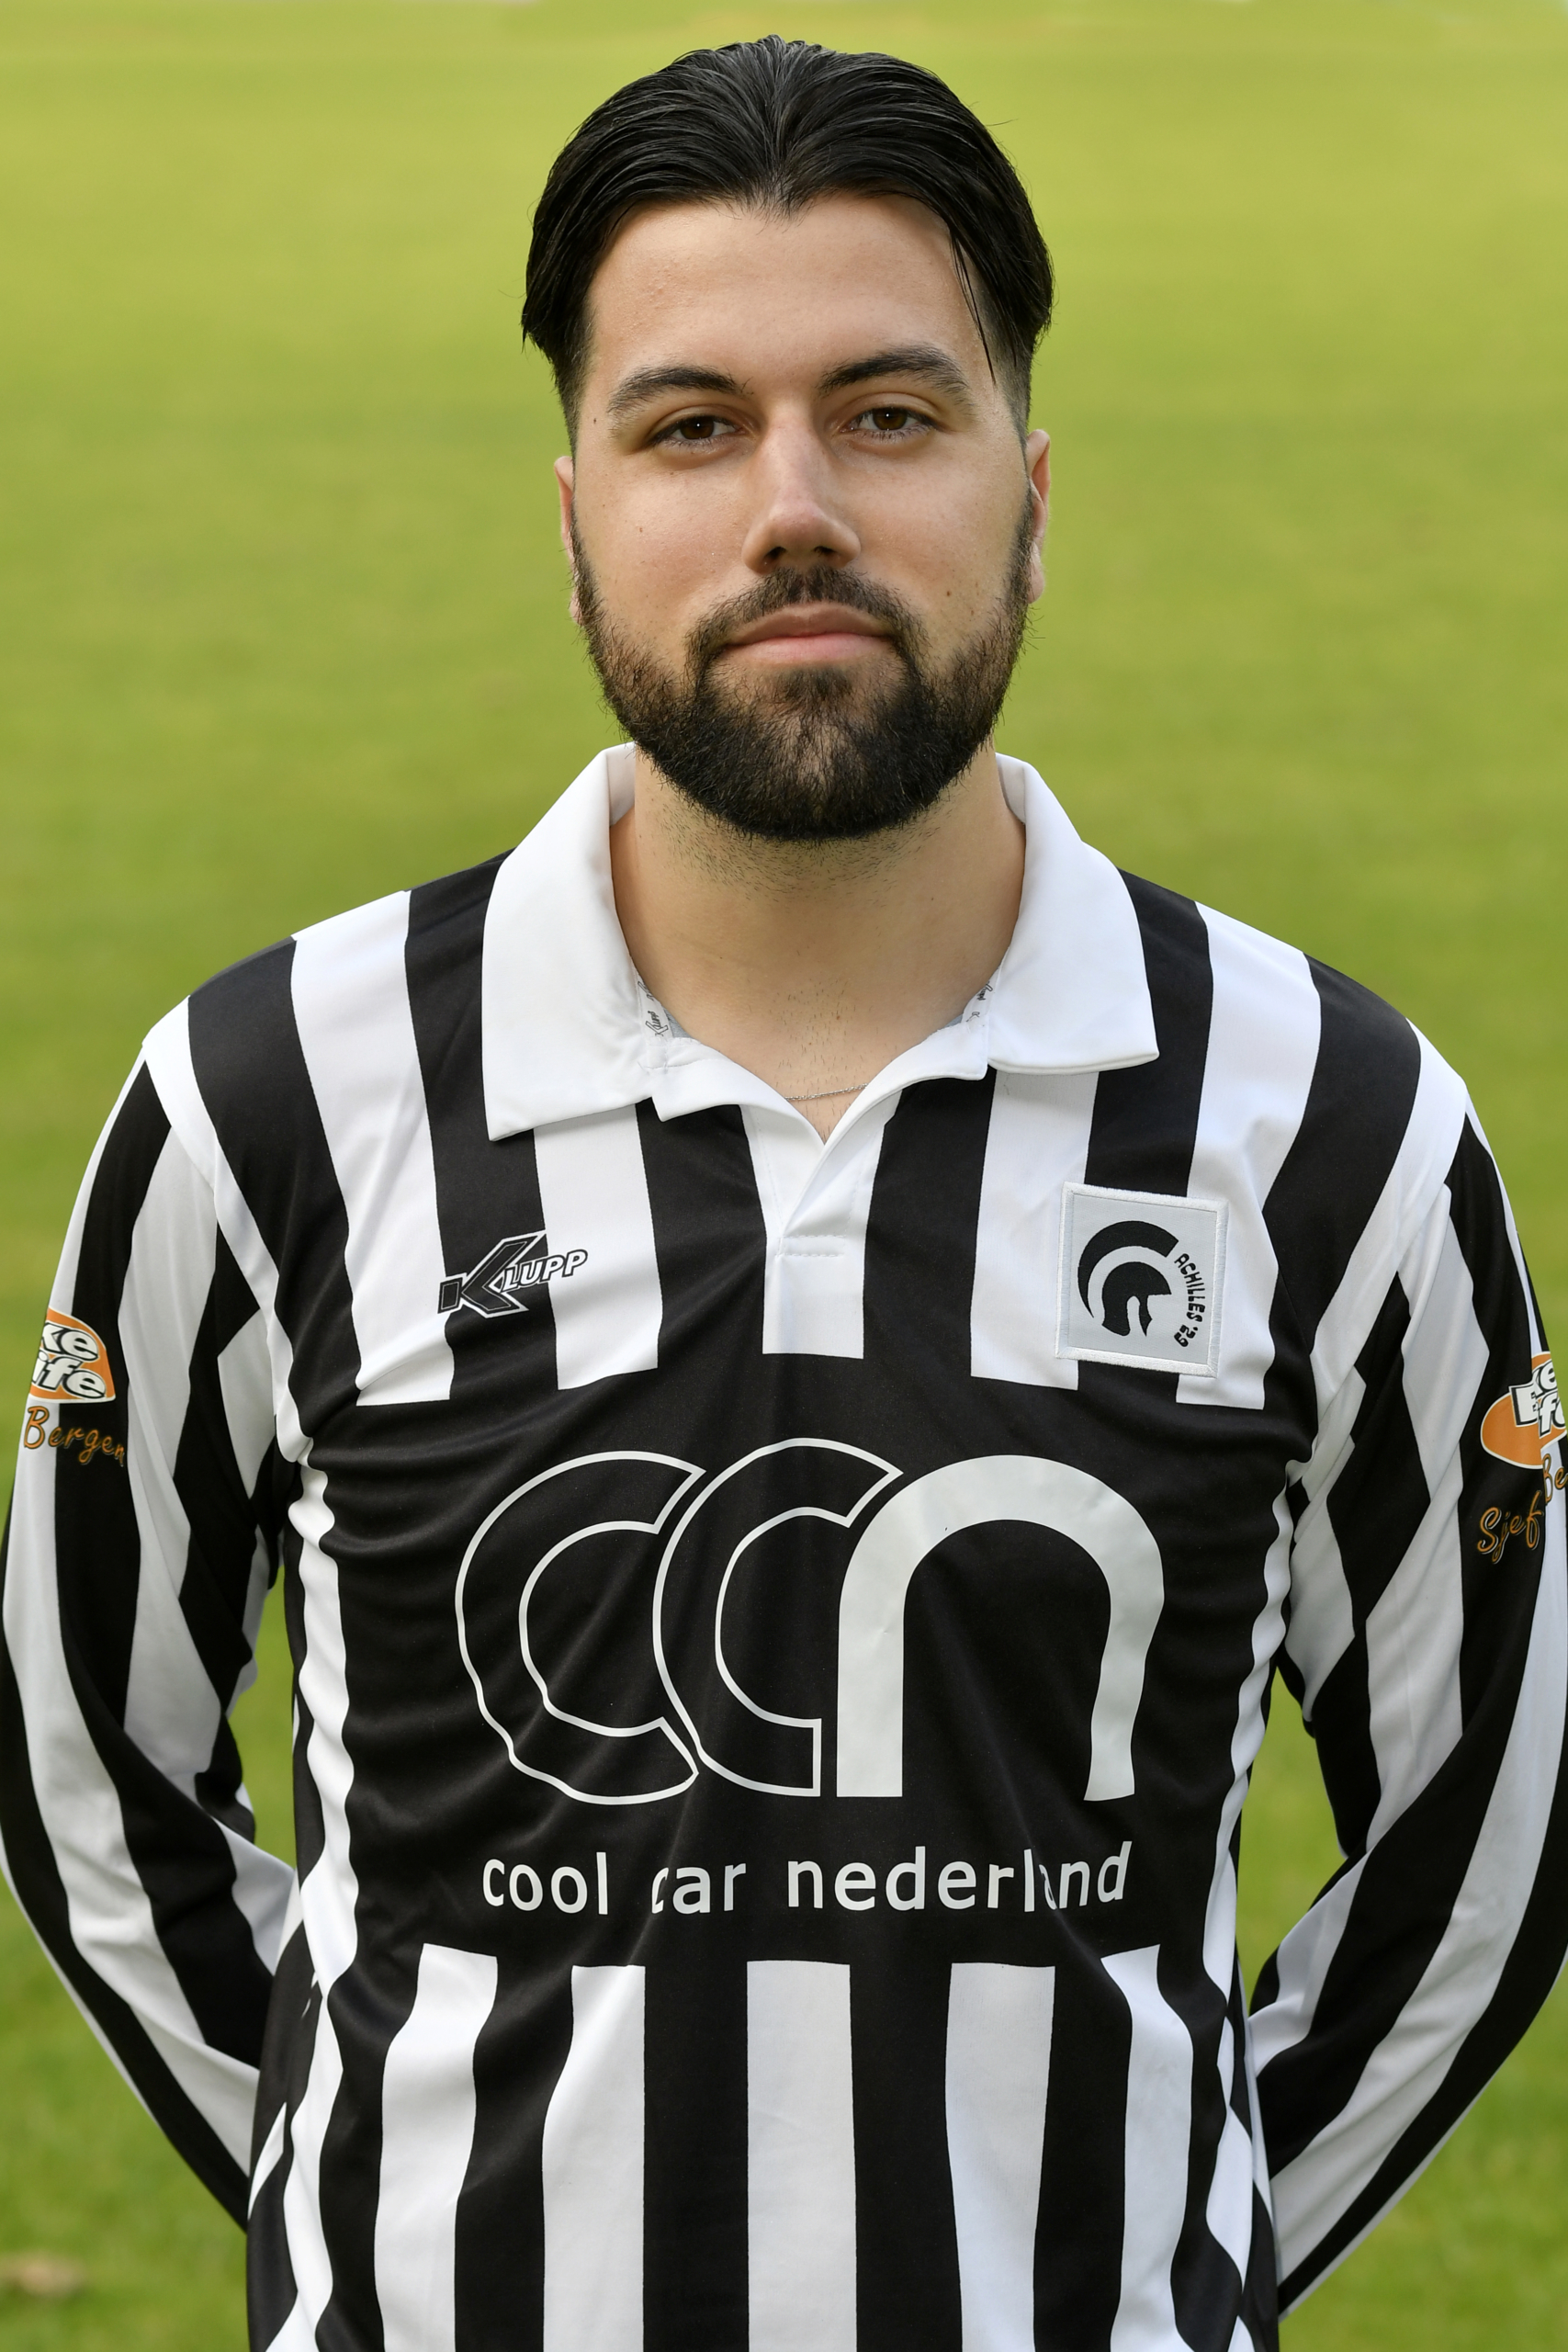 Marco Kooijmans